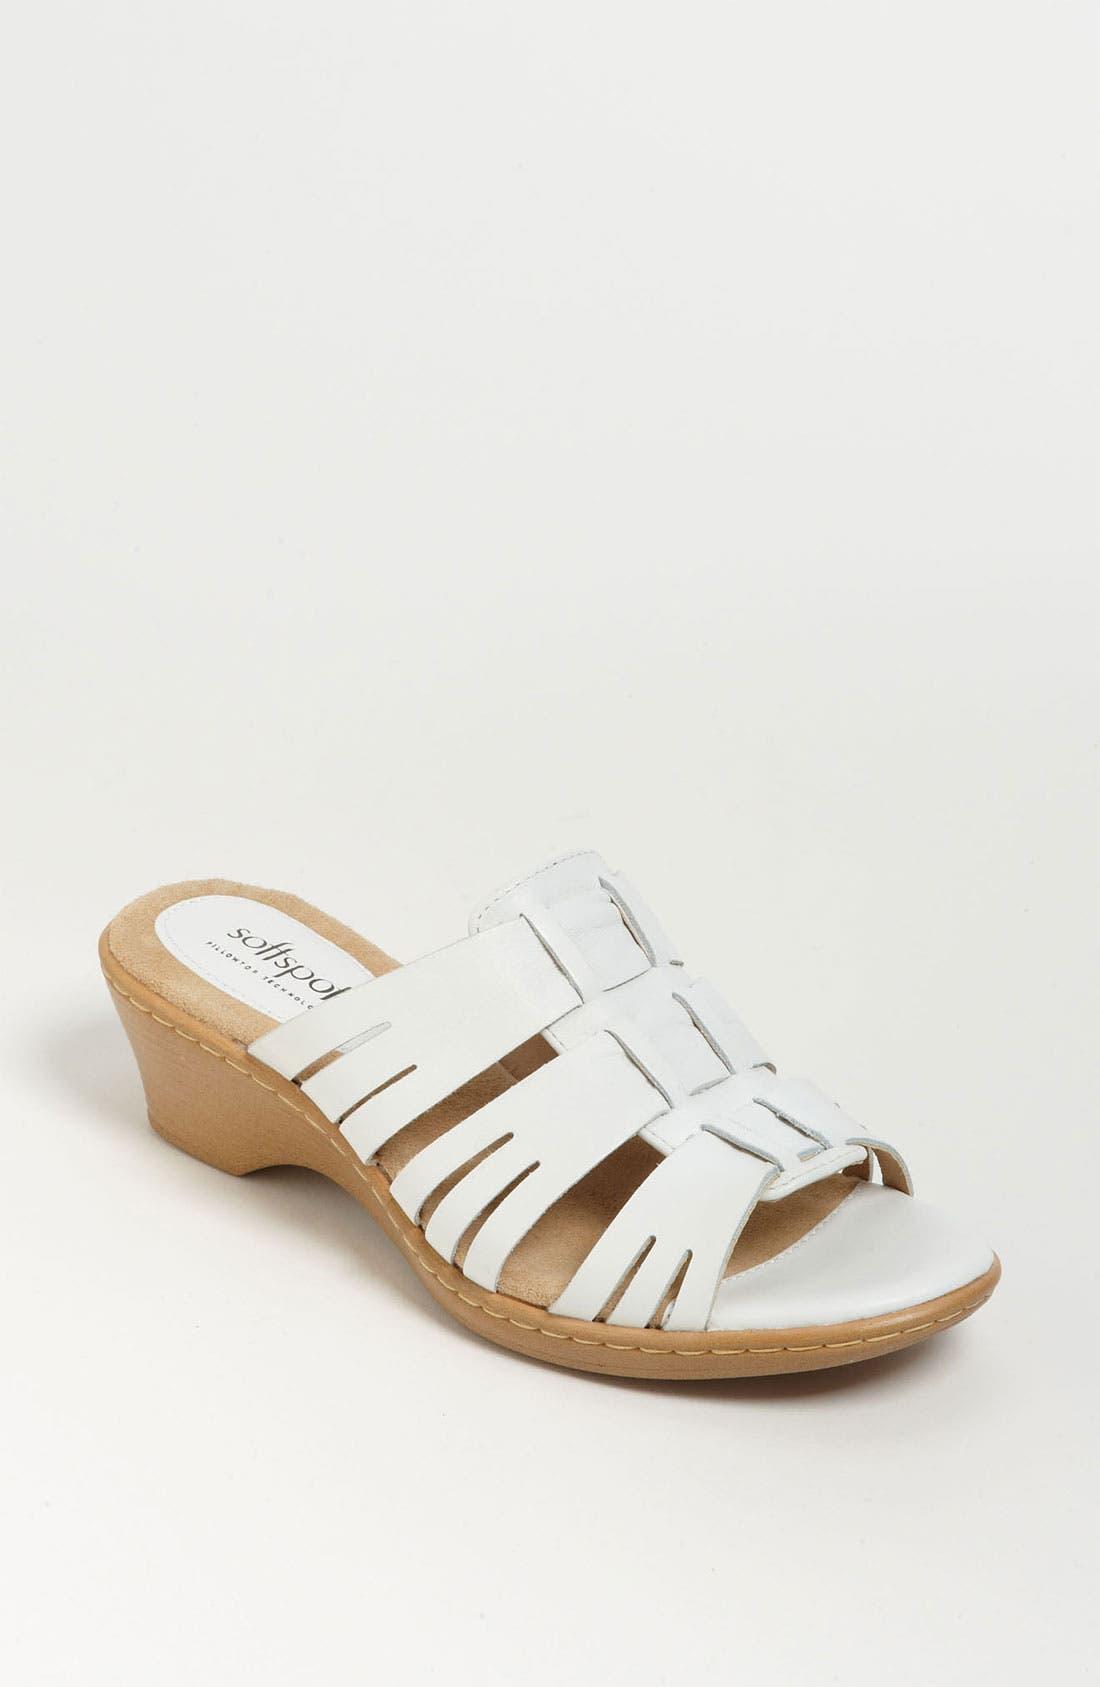 Main Image - Softspots 'Hilary' Sandal